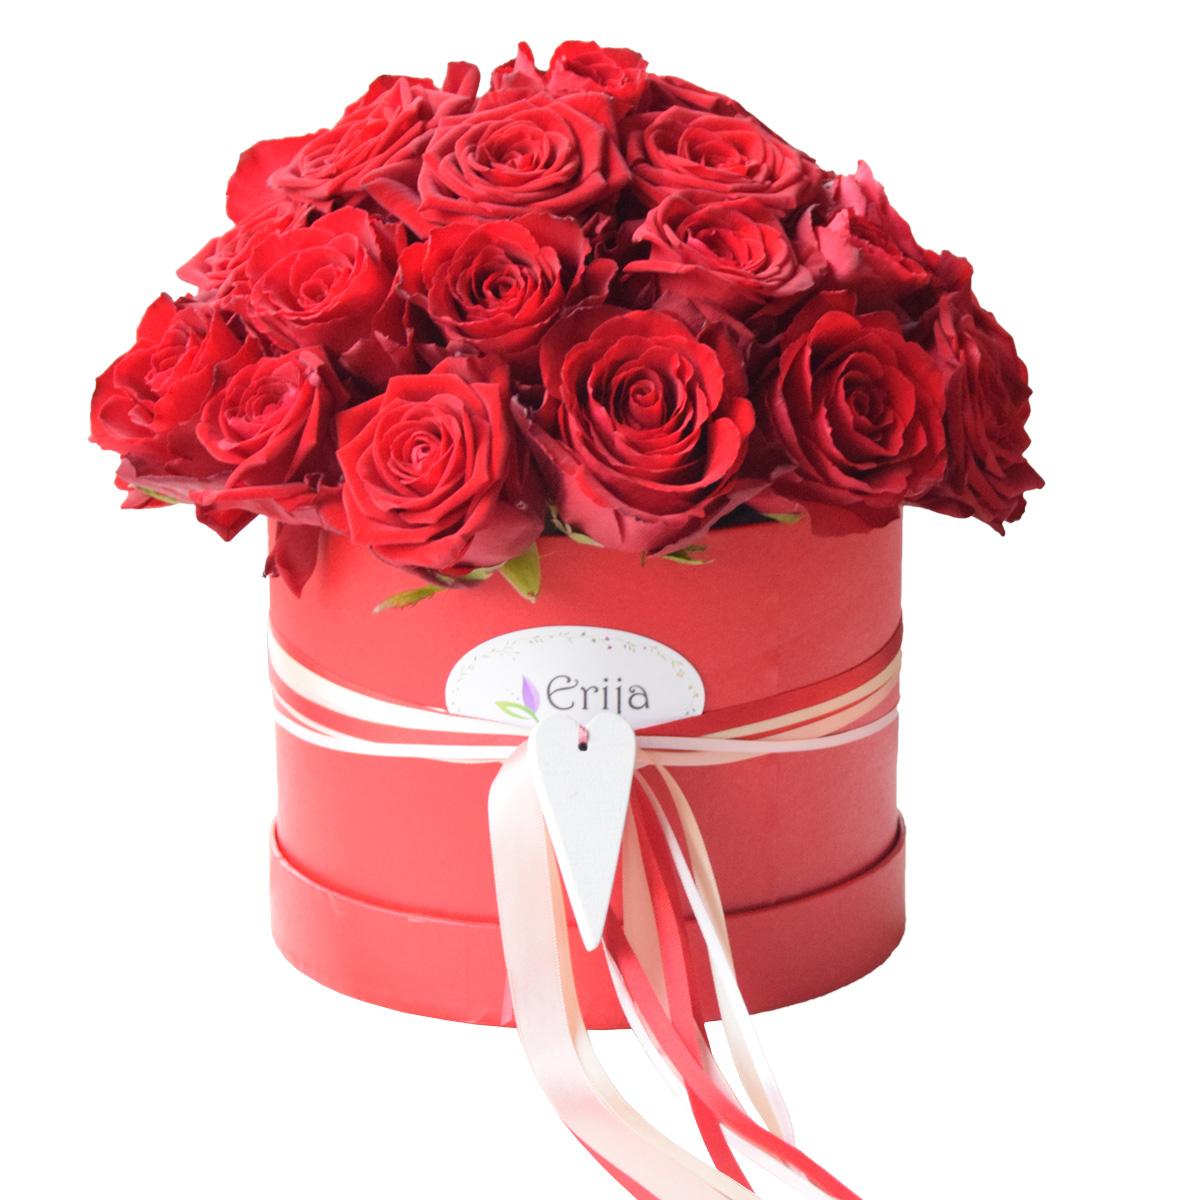 Sladka-ljubezen-Flowerbox